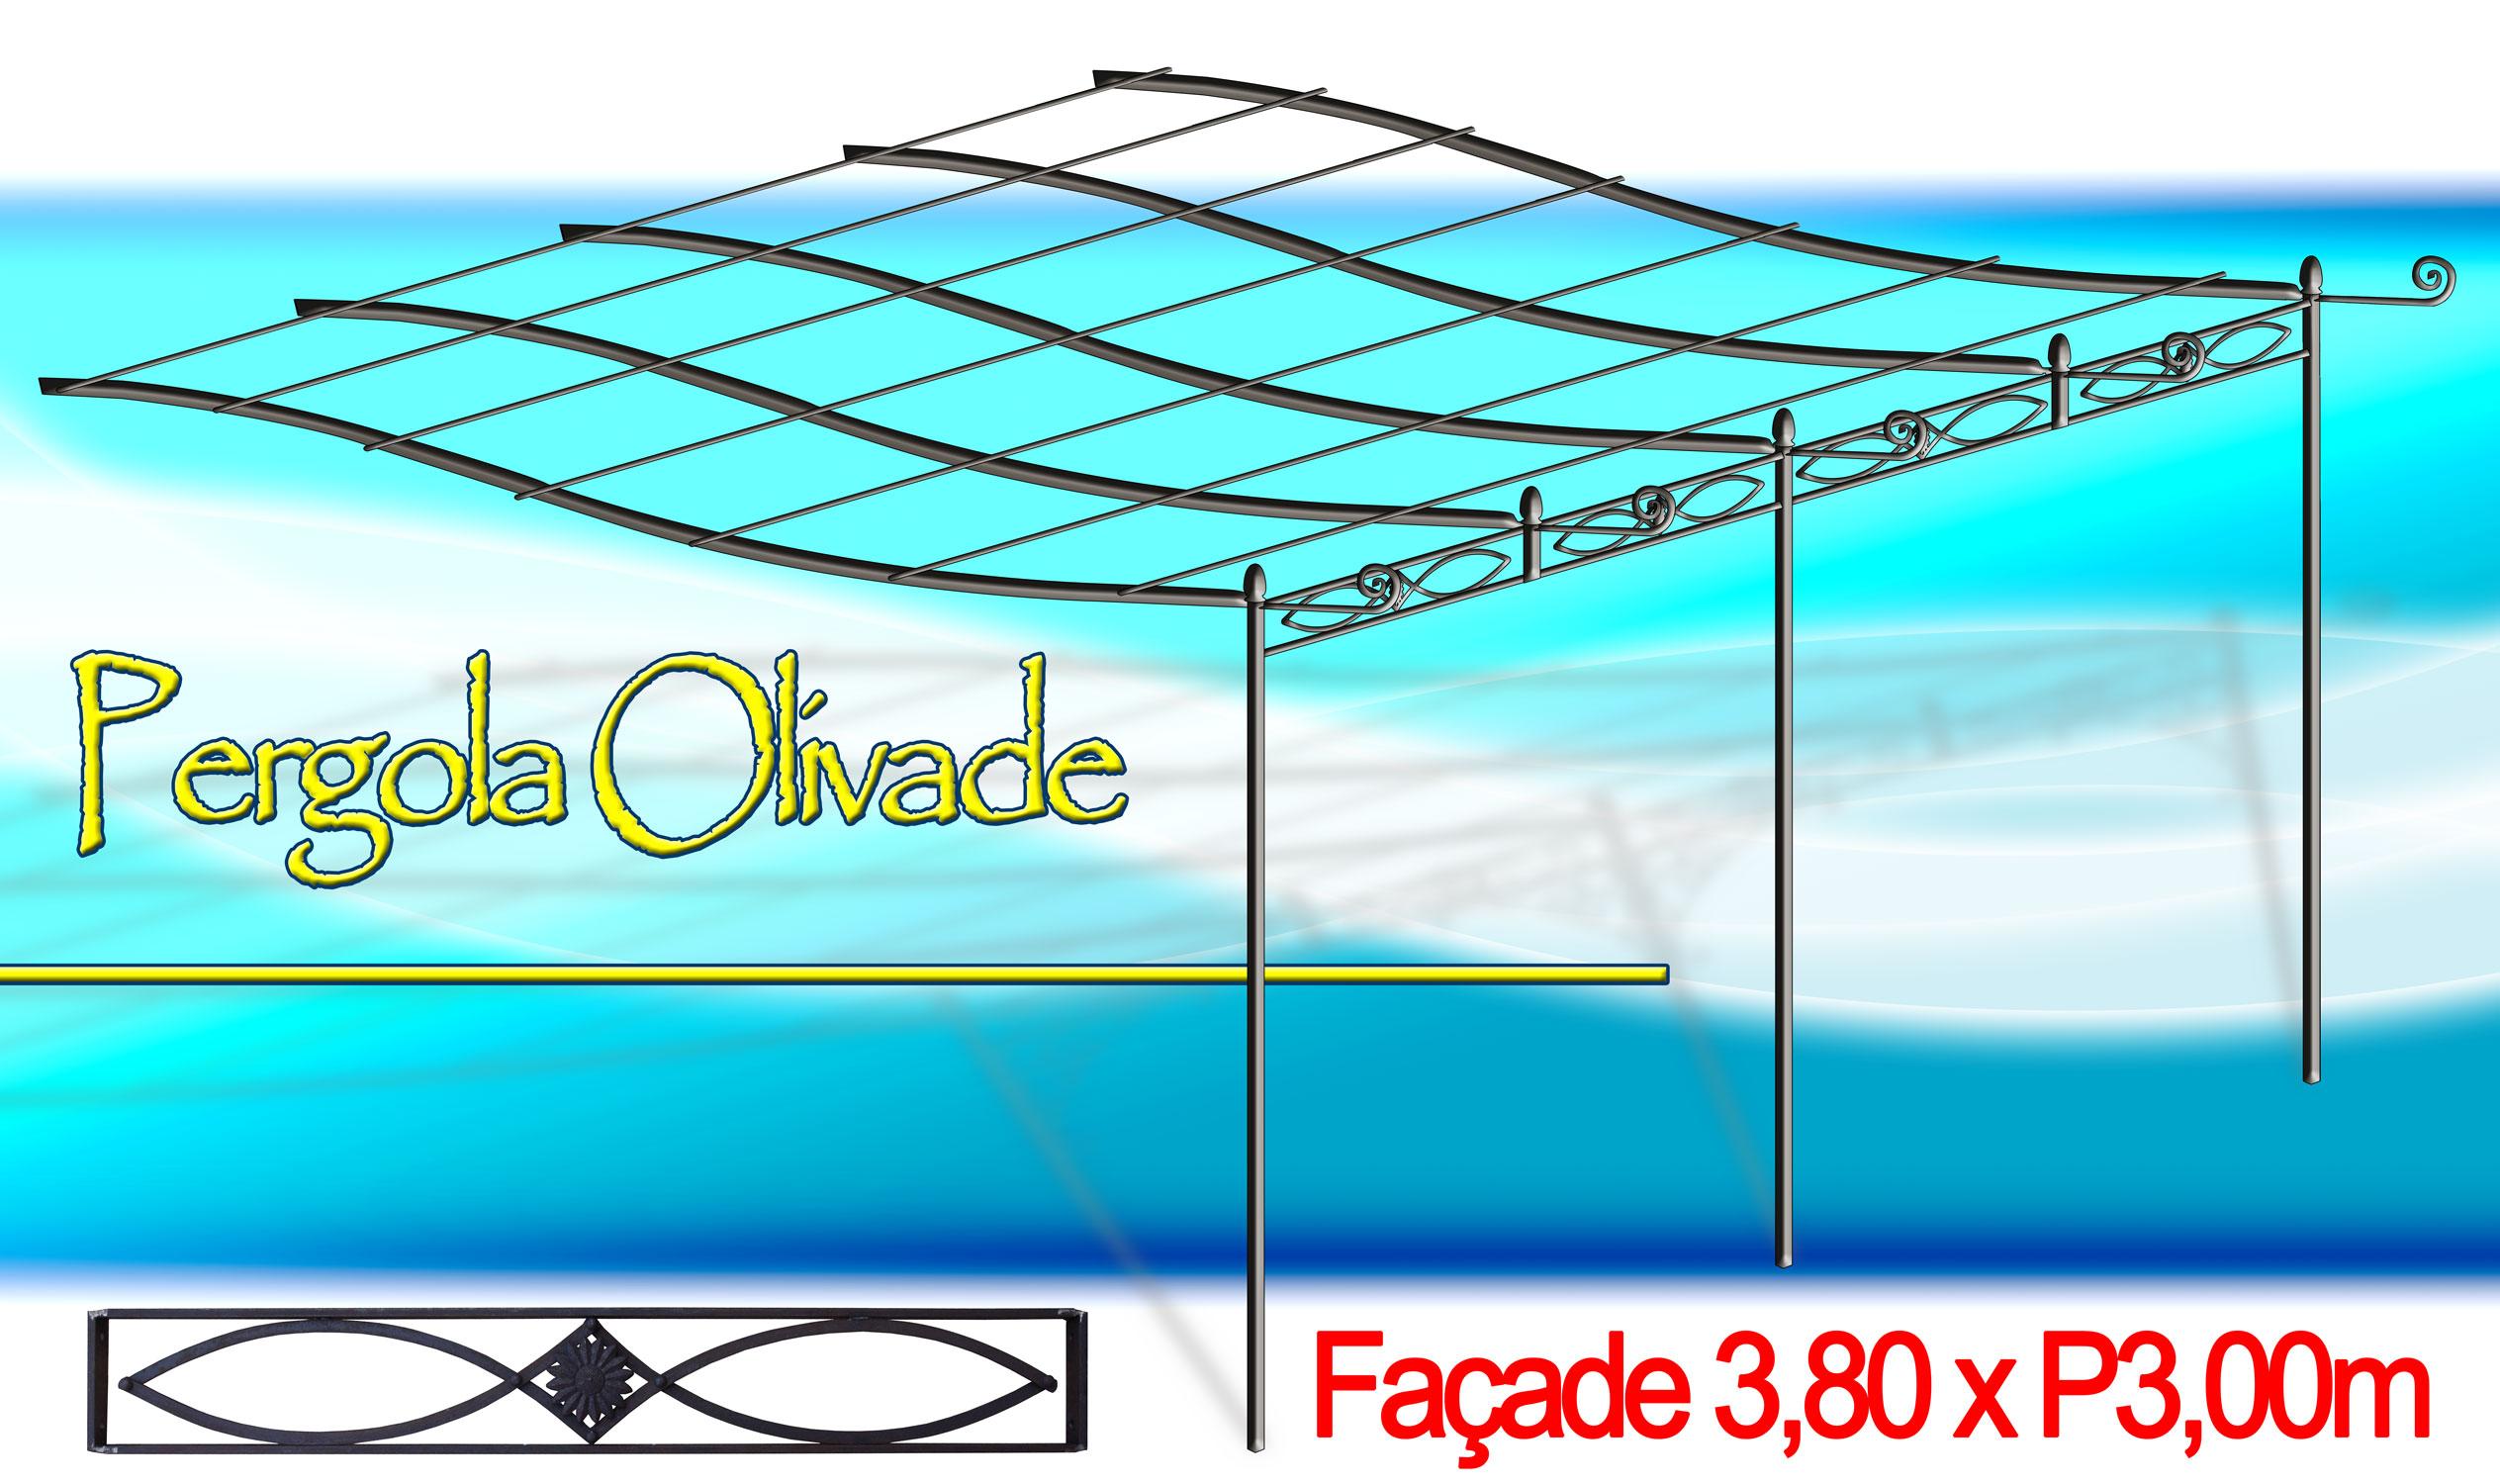 fiche article p3 pergo380m pergola olivade en kit l 3 80m x p 3 00m mod le modern. Black Bedroom Furniture Sets. Home Design Ideas